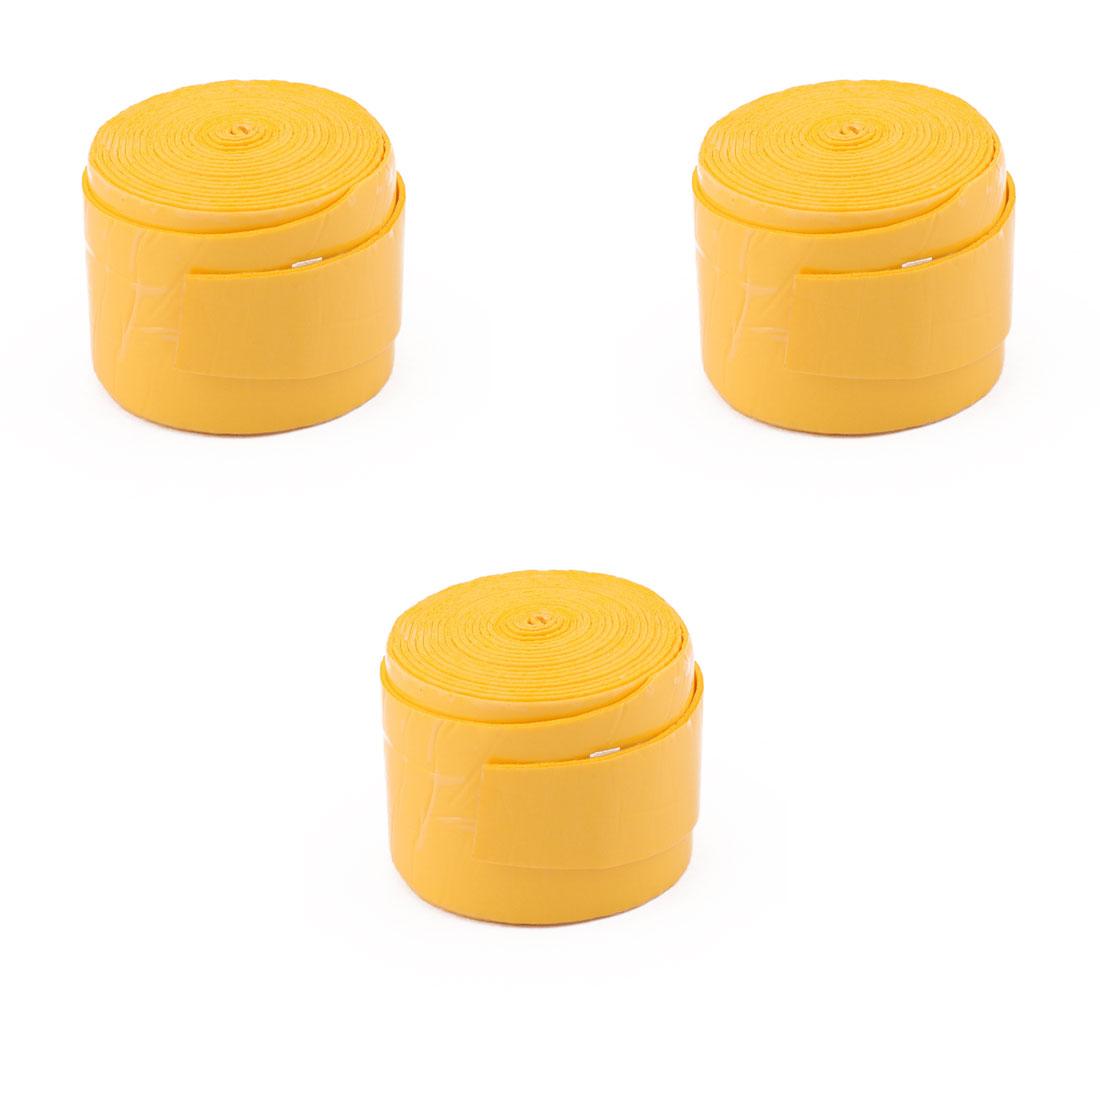 Badminton Foam Nonslip Racket Handlebar Sweat Absorbing Grip Tape Yellow 3 Pcs